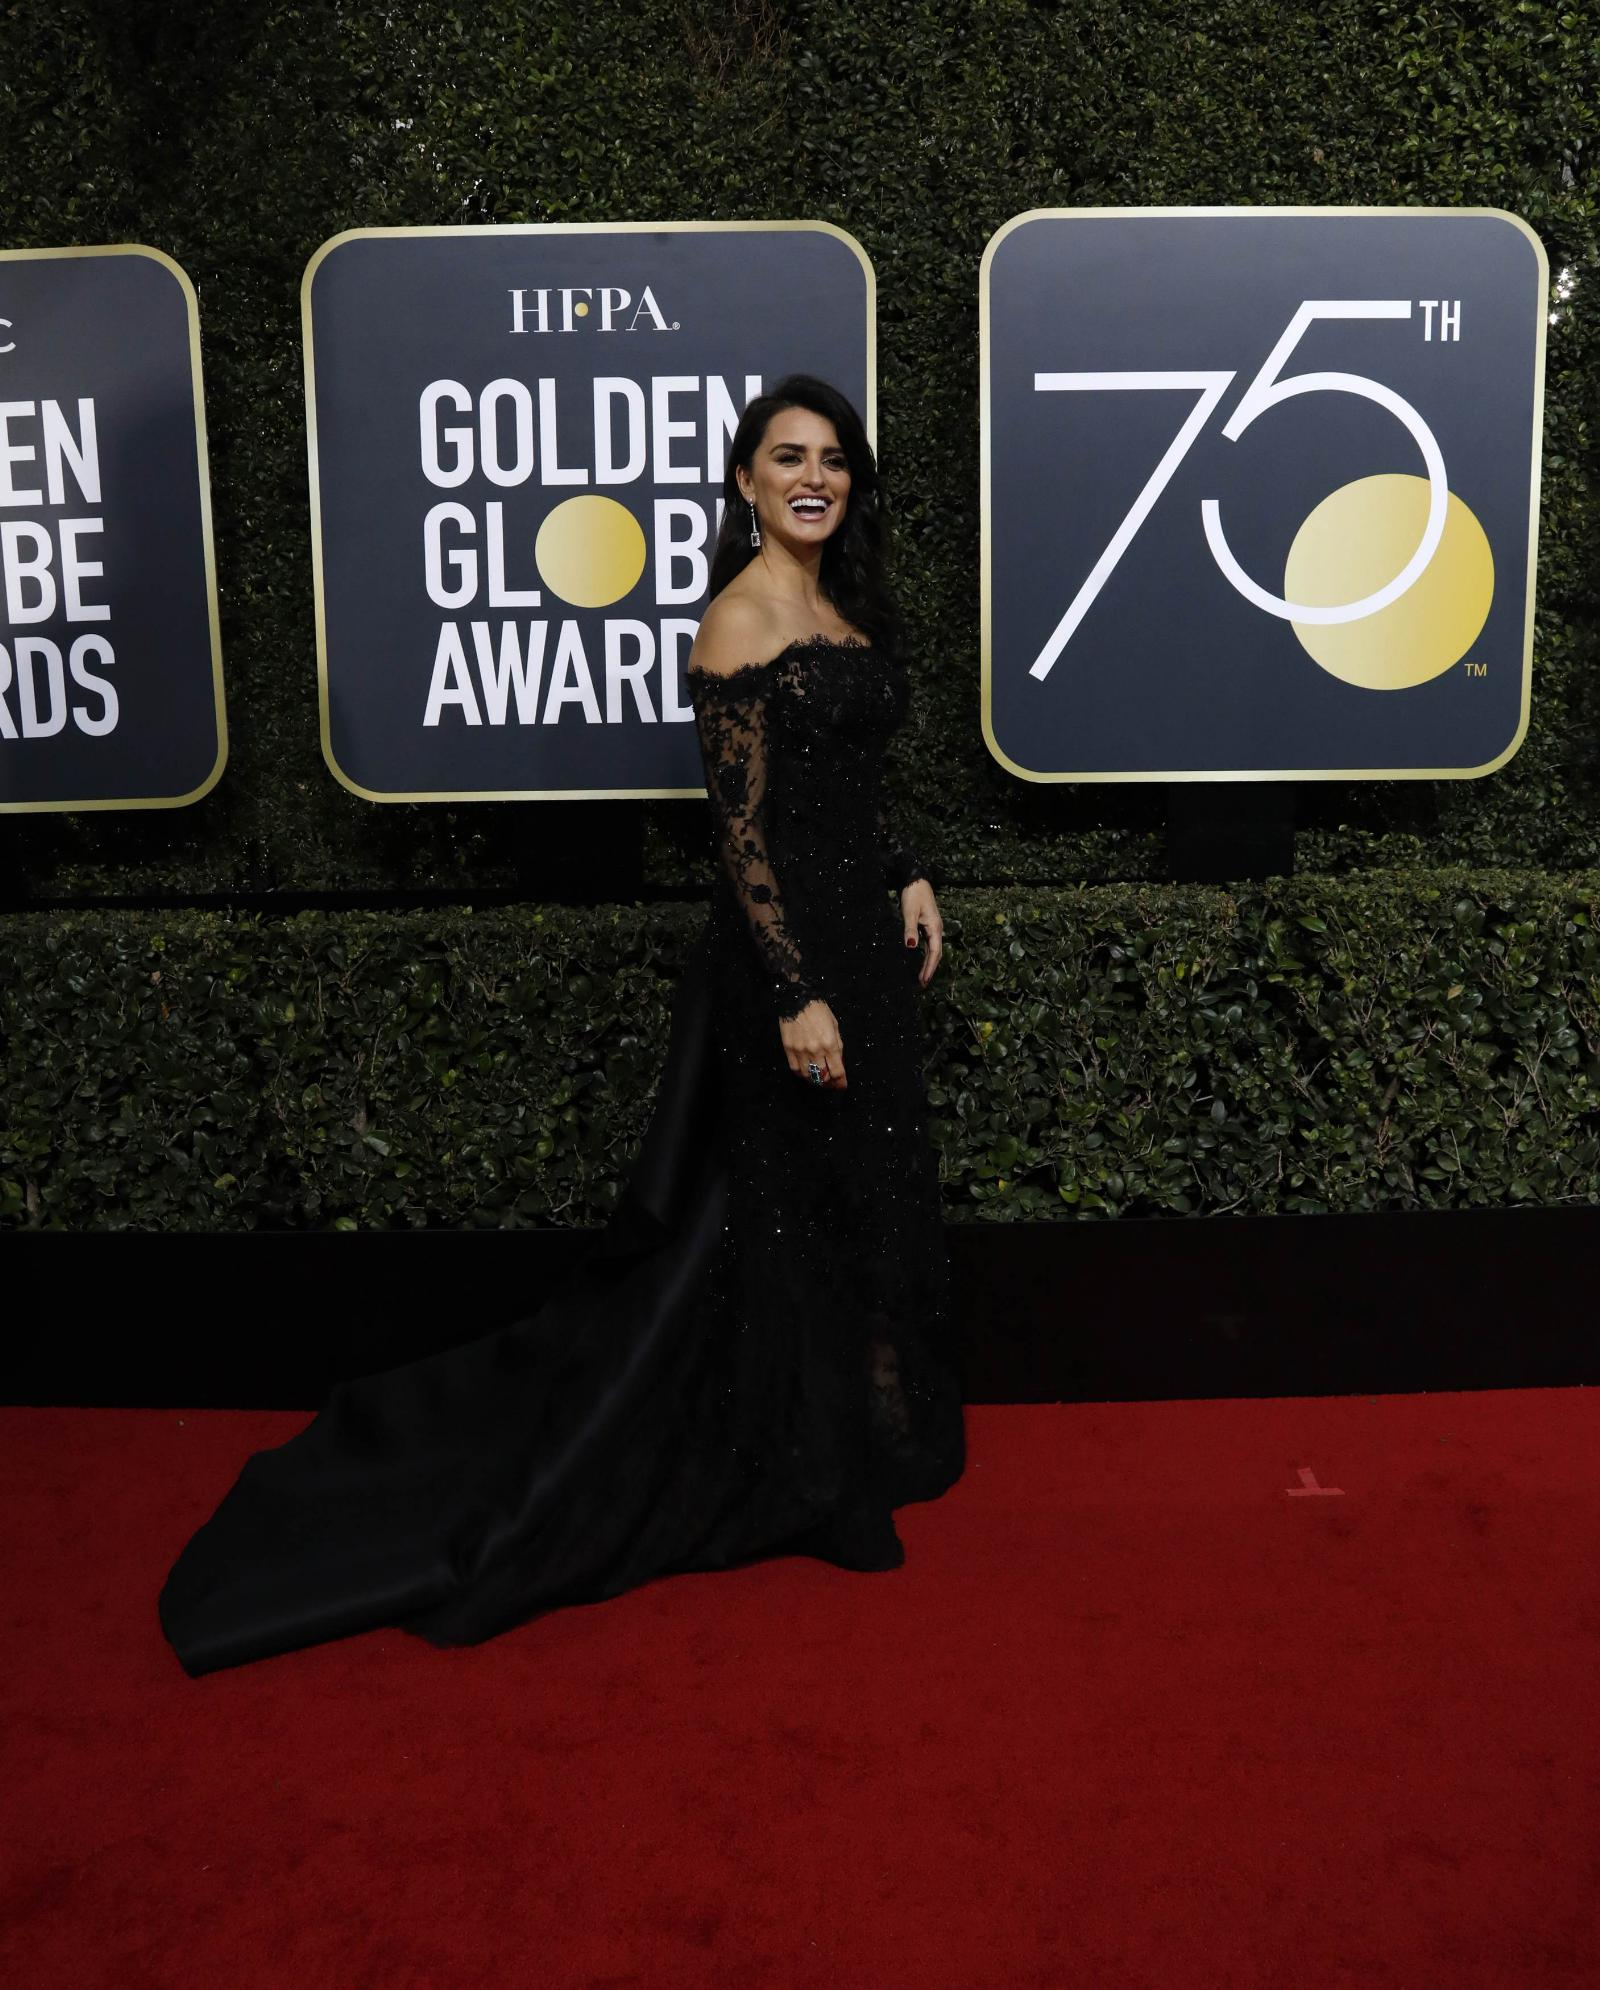 Melhores looks golden globes (55)